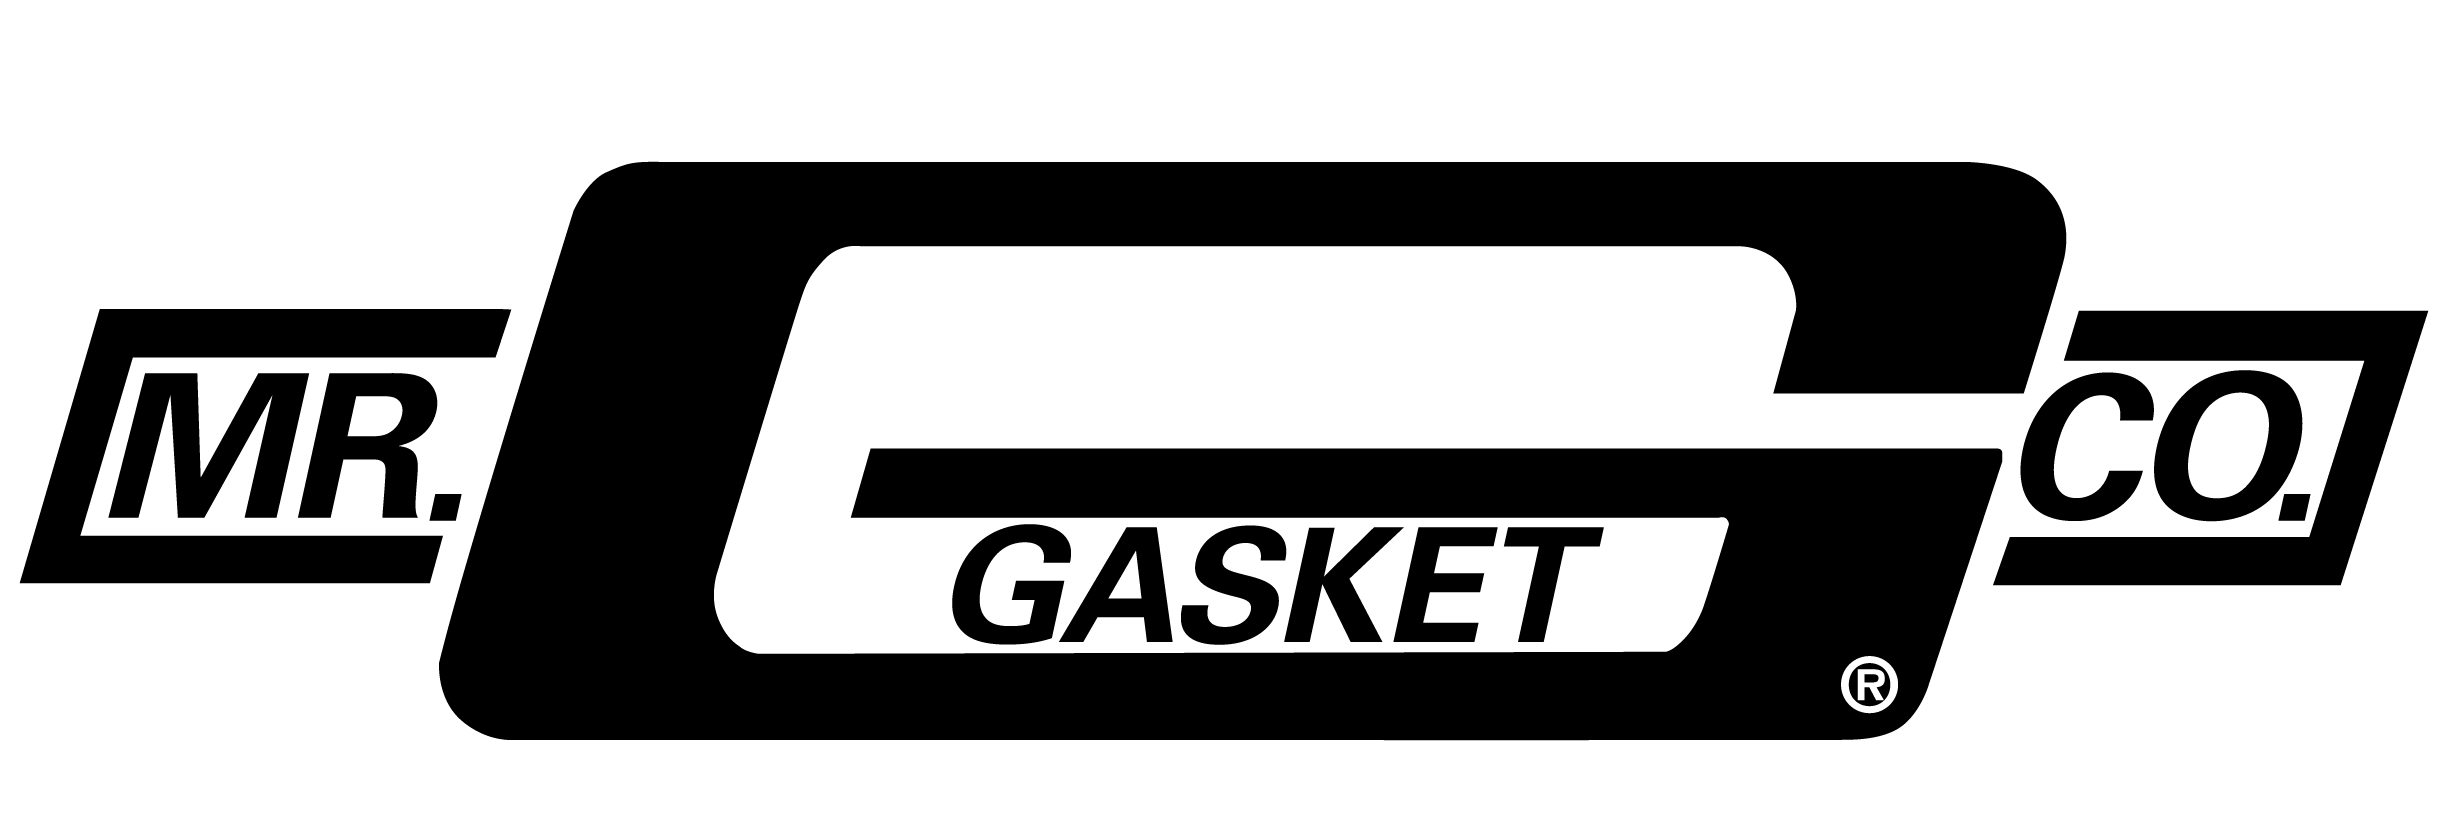 Mr. Gasket Co logo